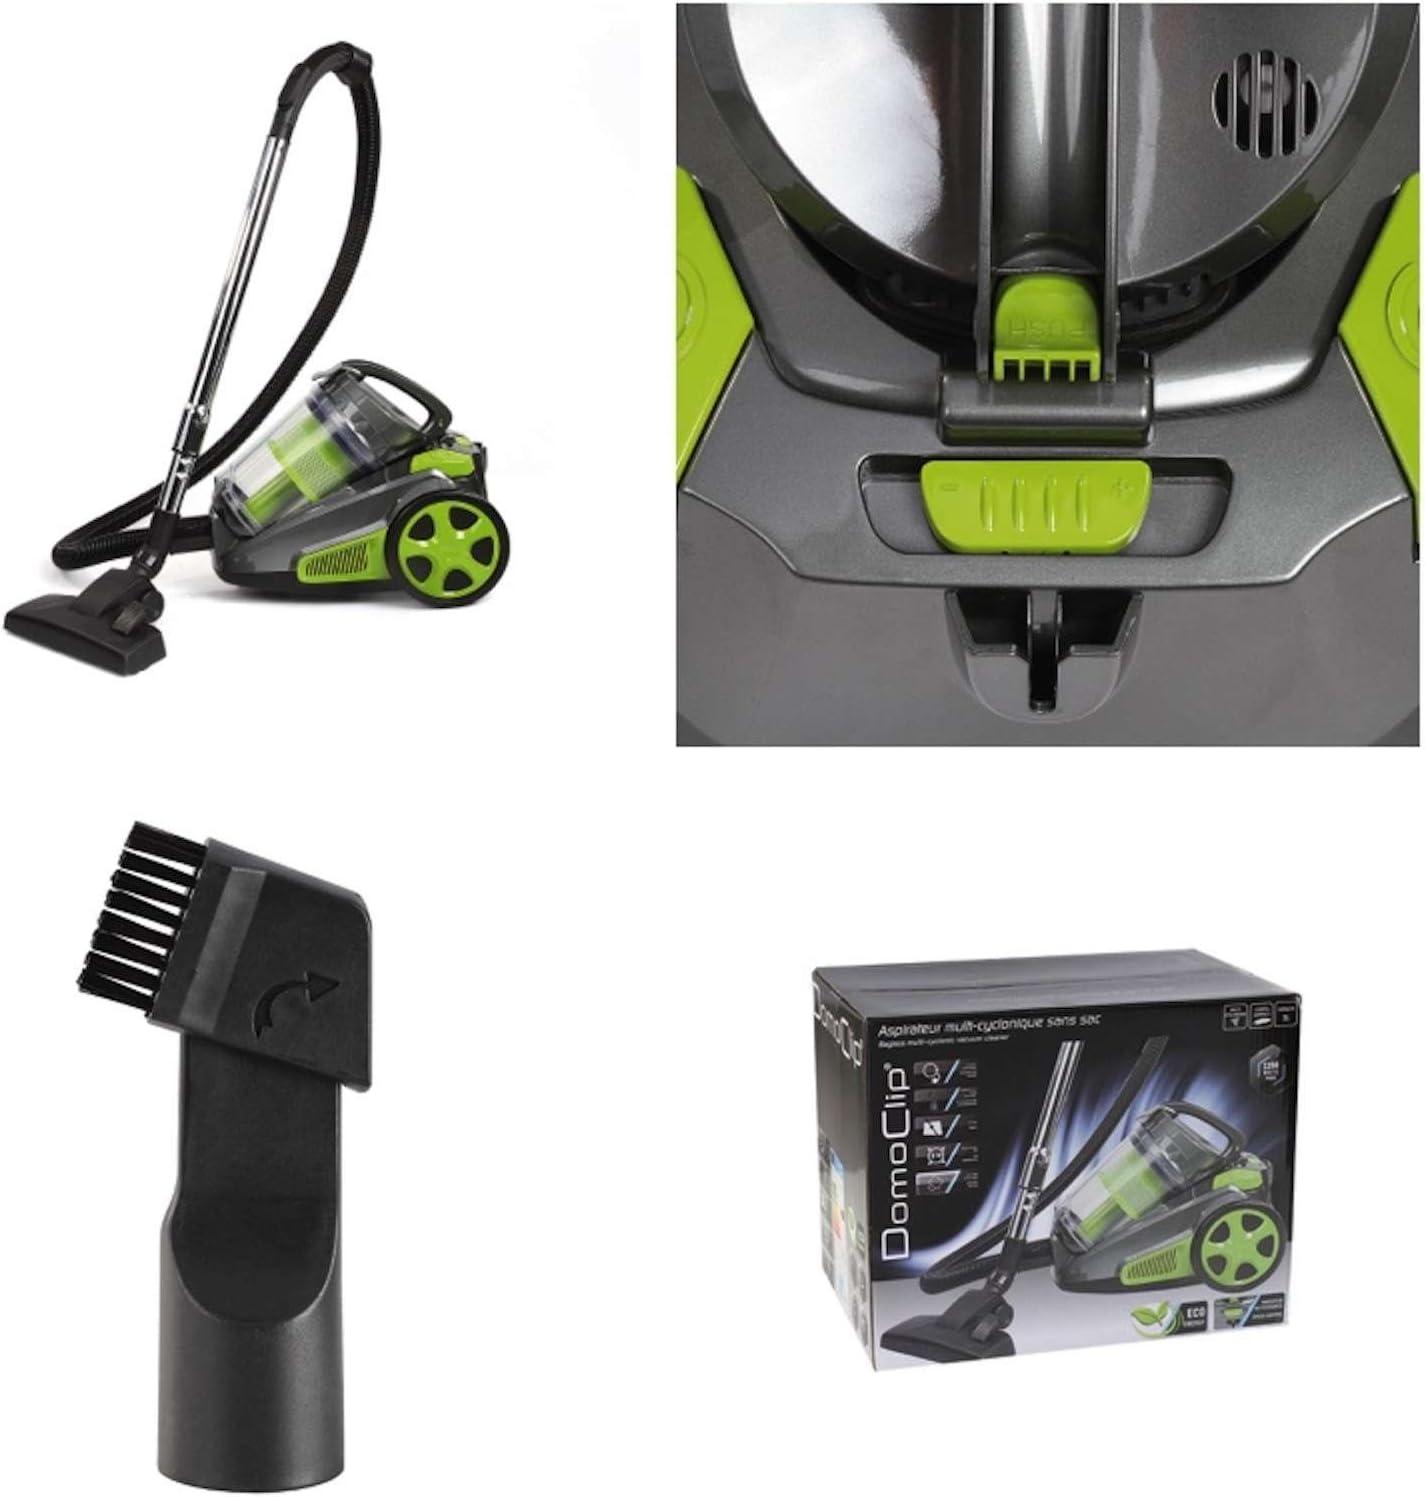 Multi de – Aspirador ciclónico sin bolsa con asa (aspirador, Suelo, 3 litros, potencia de 1000 W, RADIUS 8 metros, verde): Amazon.es: Hogar